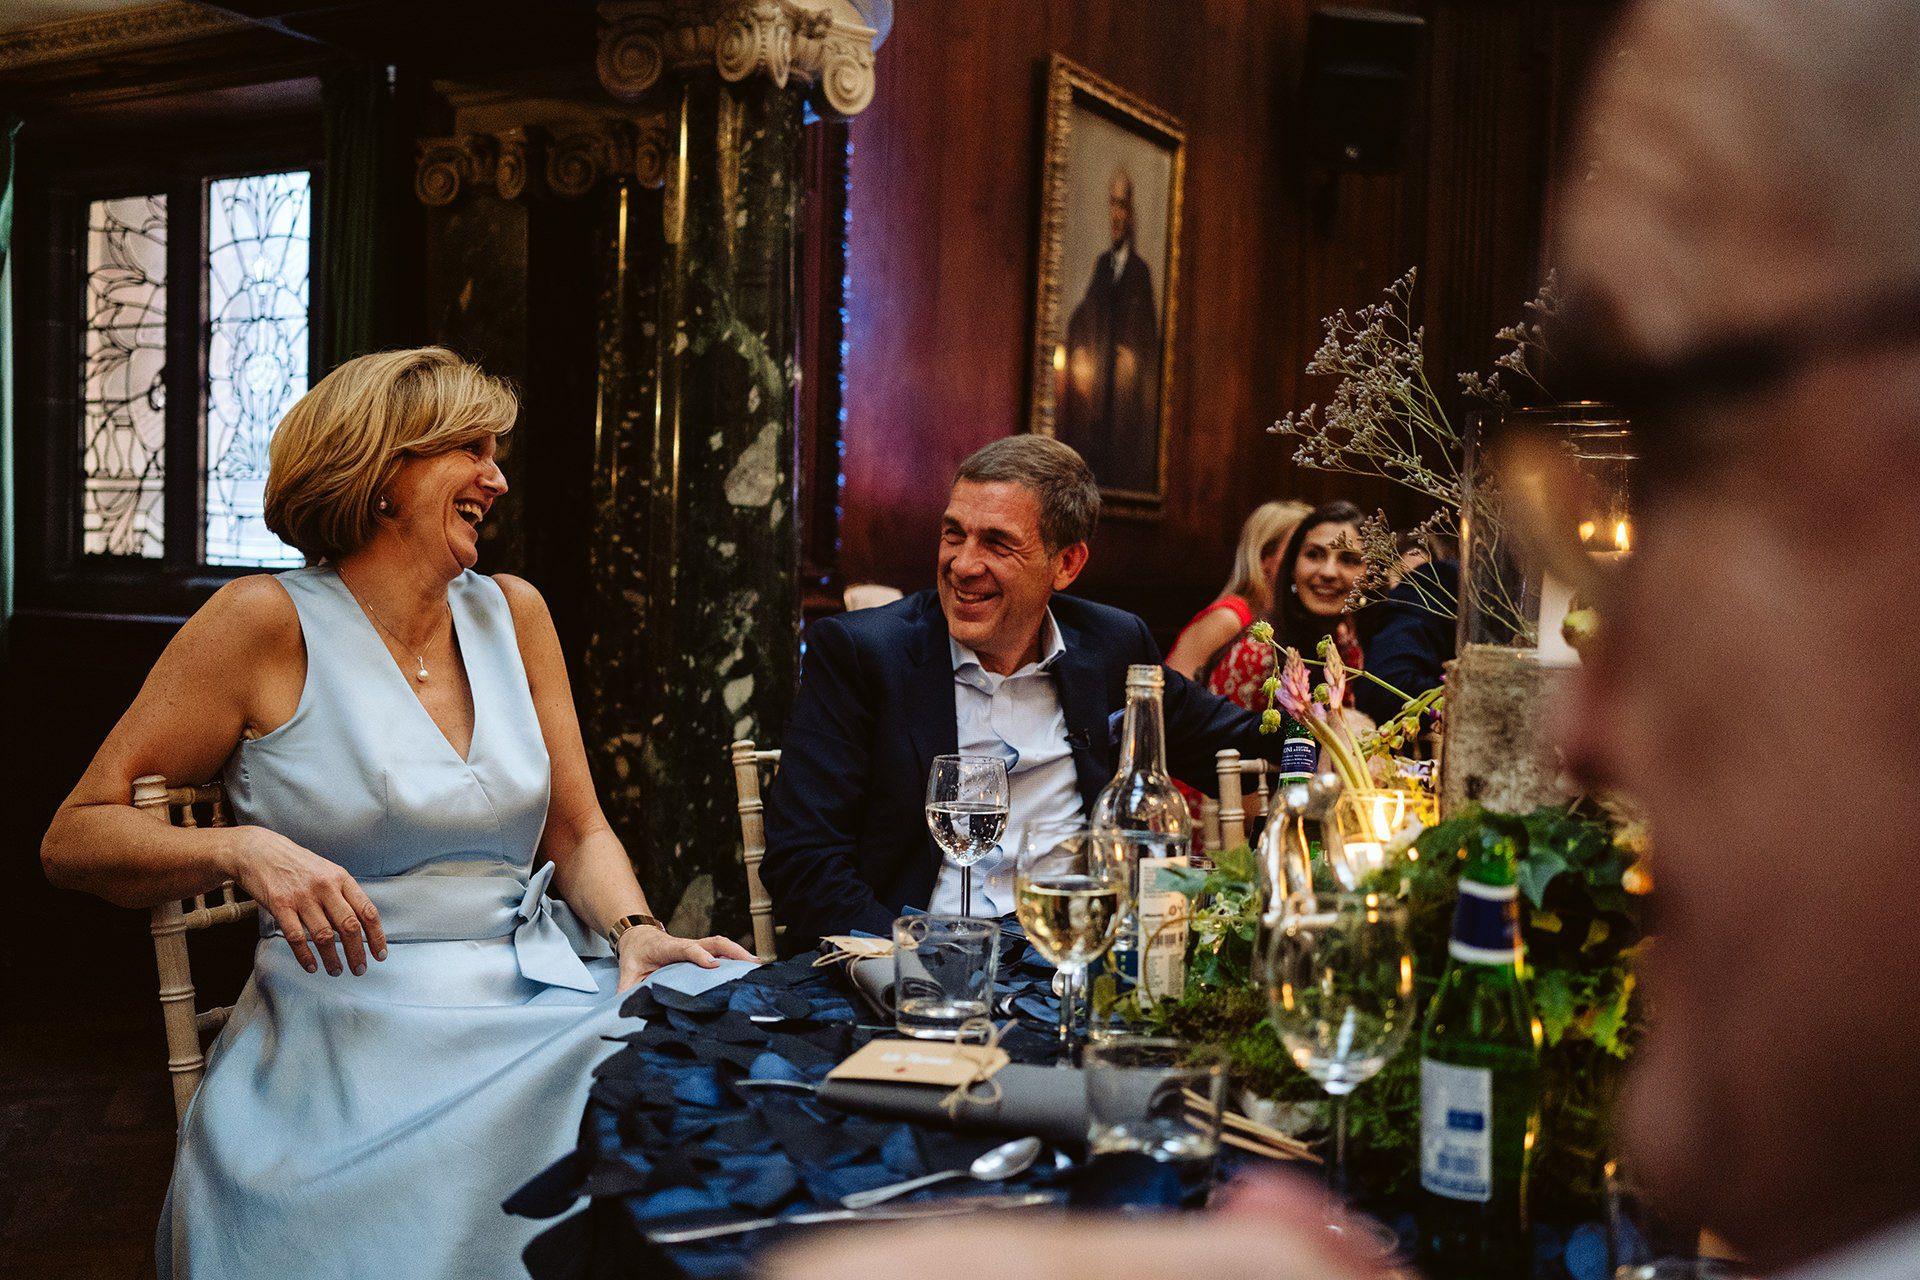 Wedding vow renewal Photographer